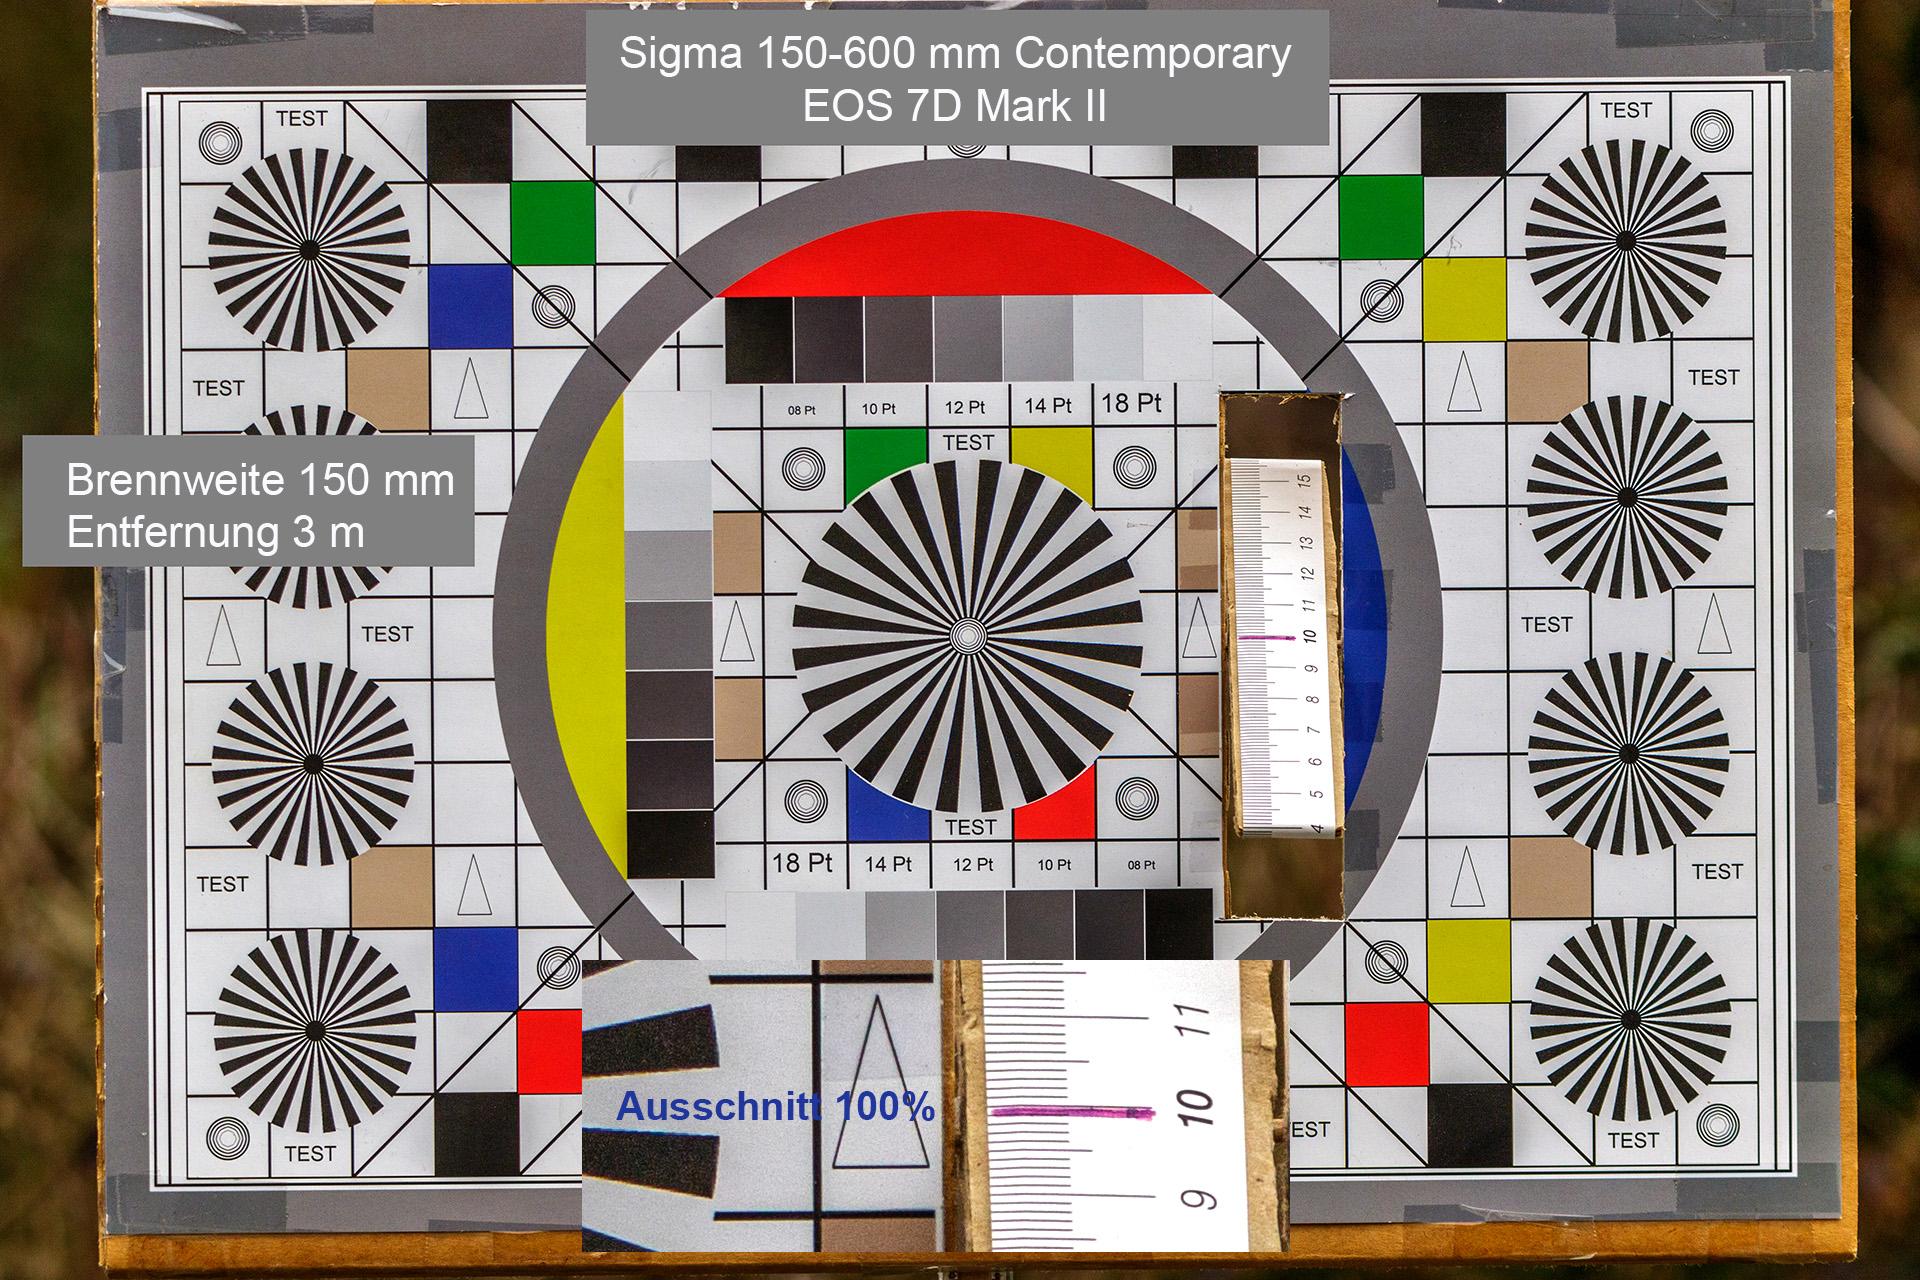 Testaufnahmen, Sigma 150-600 mm, 7D Mark II, 3 Meter, 150 mm